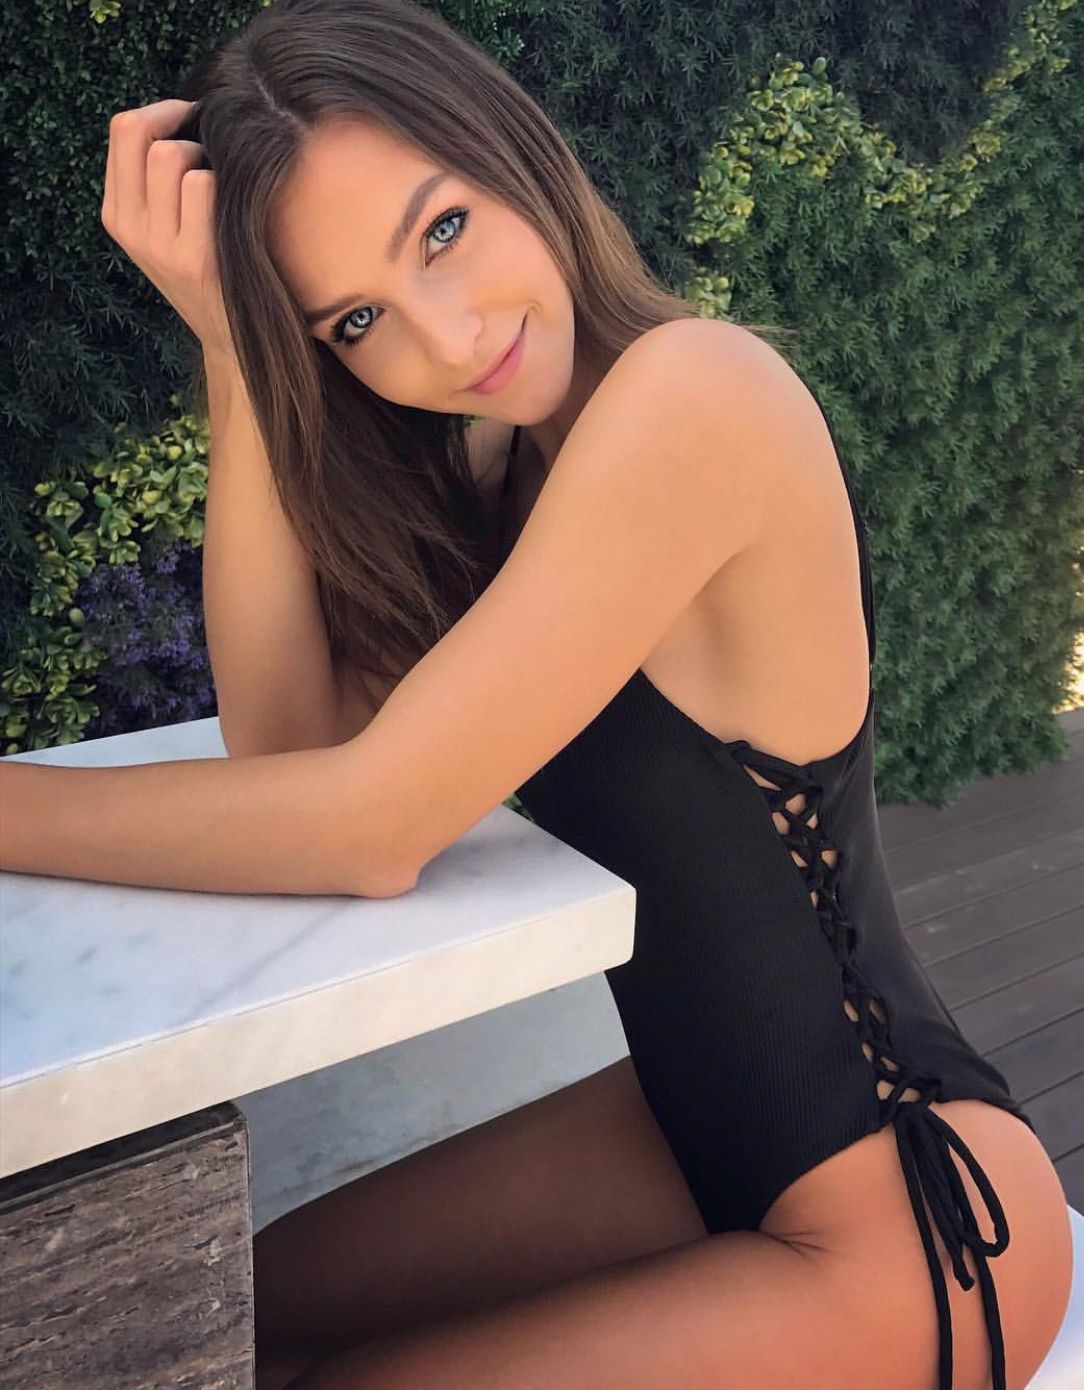 pictures Nude pics of Rachel Cook. 2018-2019 celebrityes photos leaks!